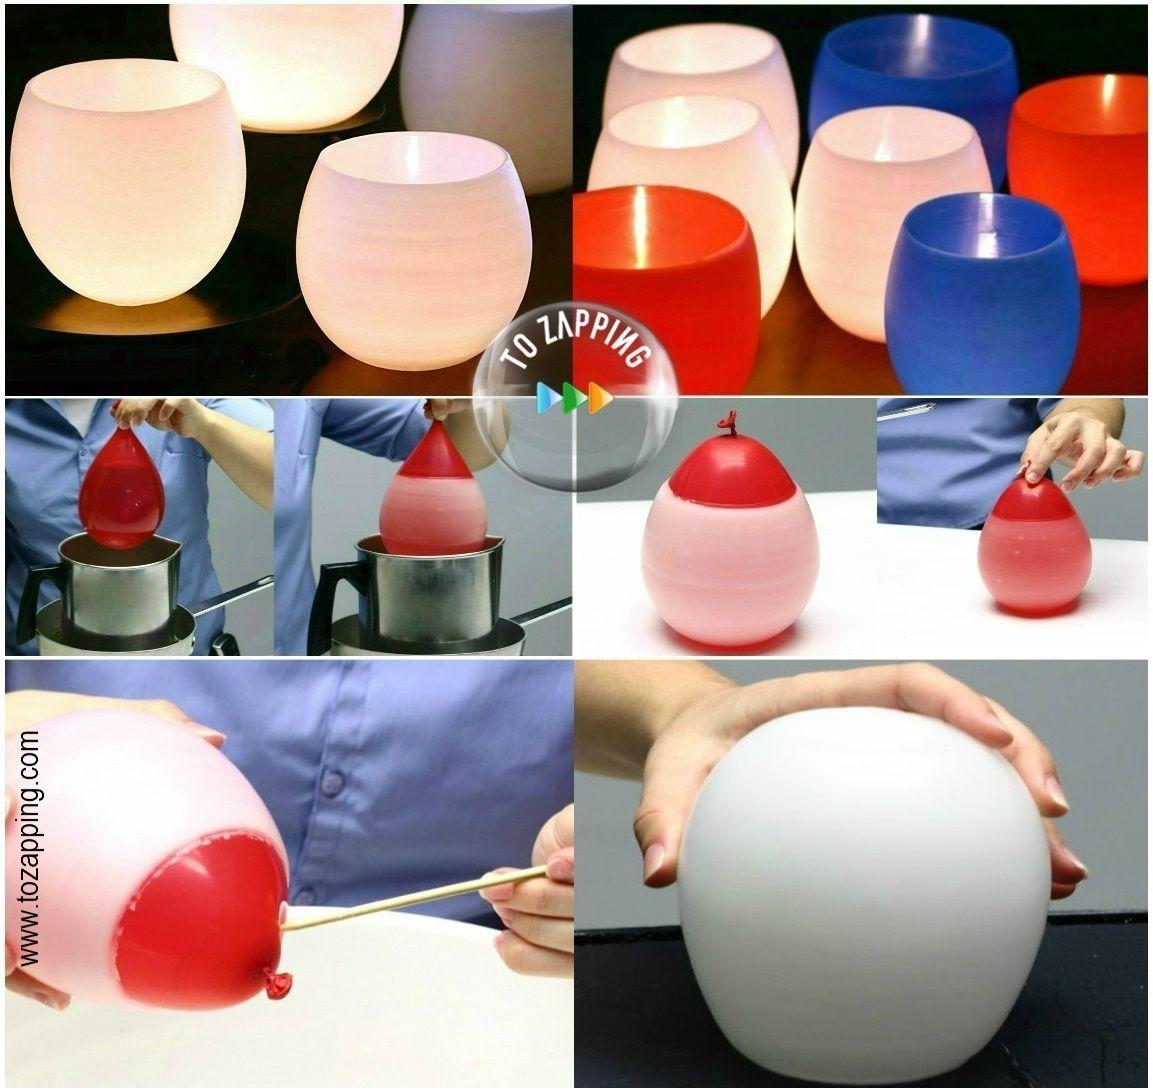 Portavelas hechos con globos globoflexia pinterest - Manualidades para decorar el hogar paso a paso ...